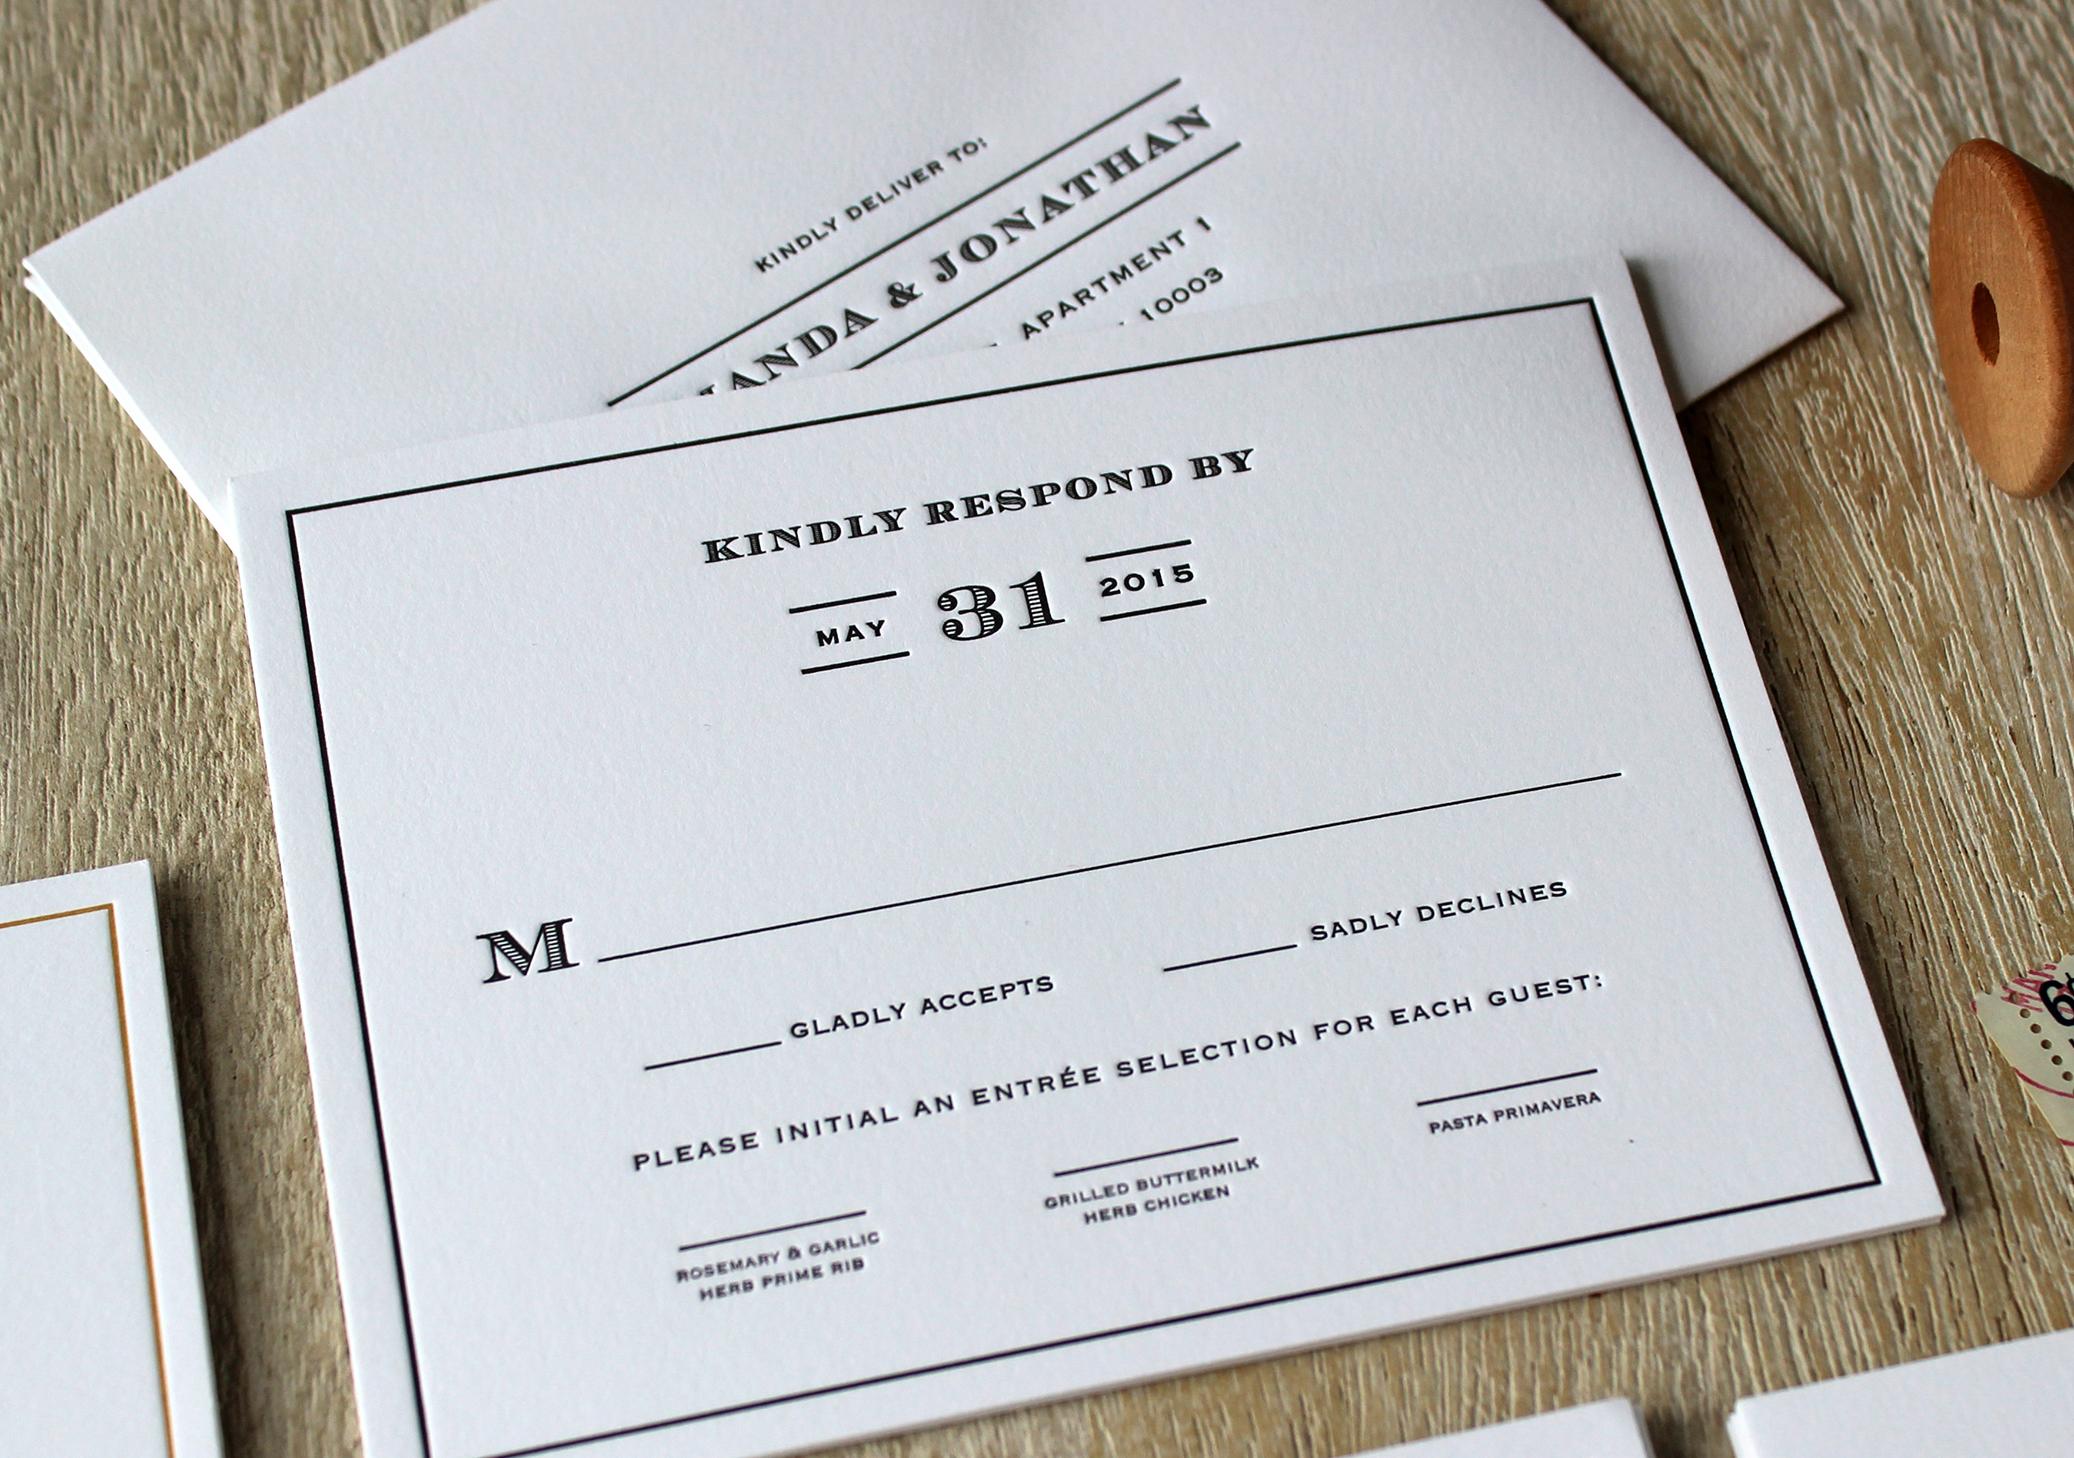 NYC-new-york-vintage-letterpress-wedding-invitations-rsvp